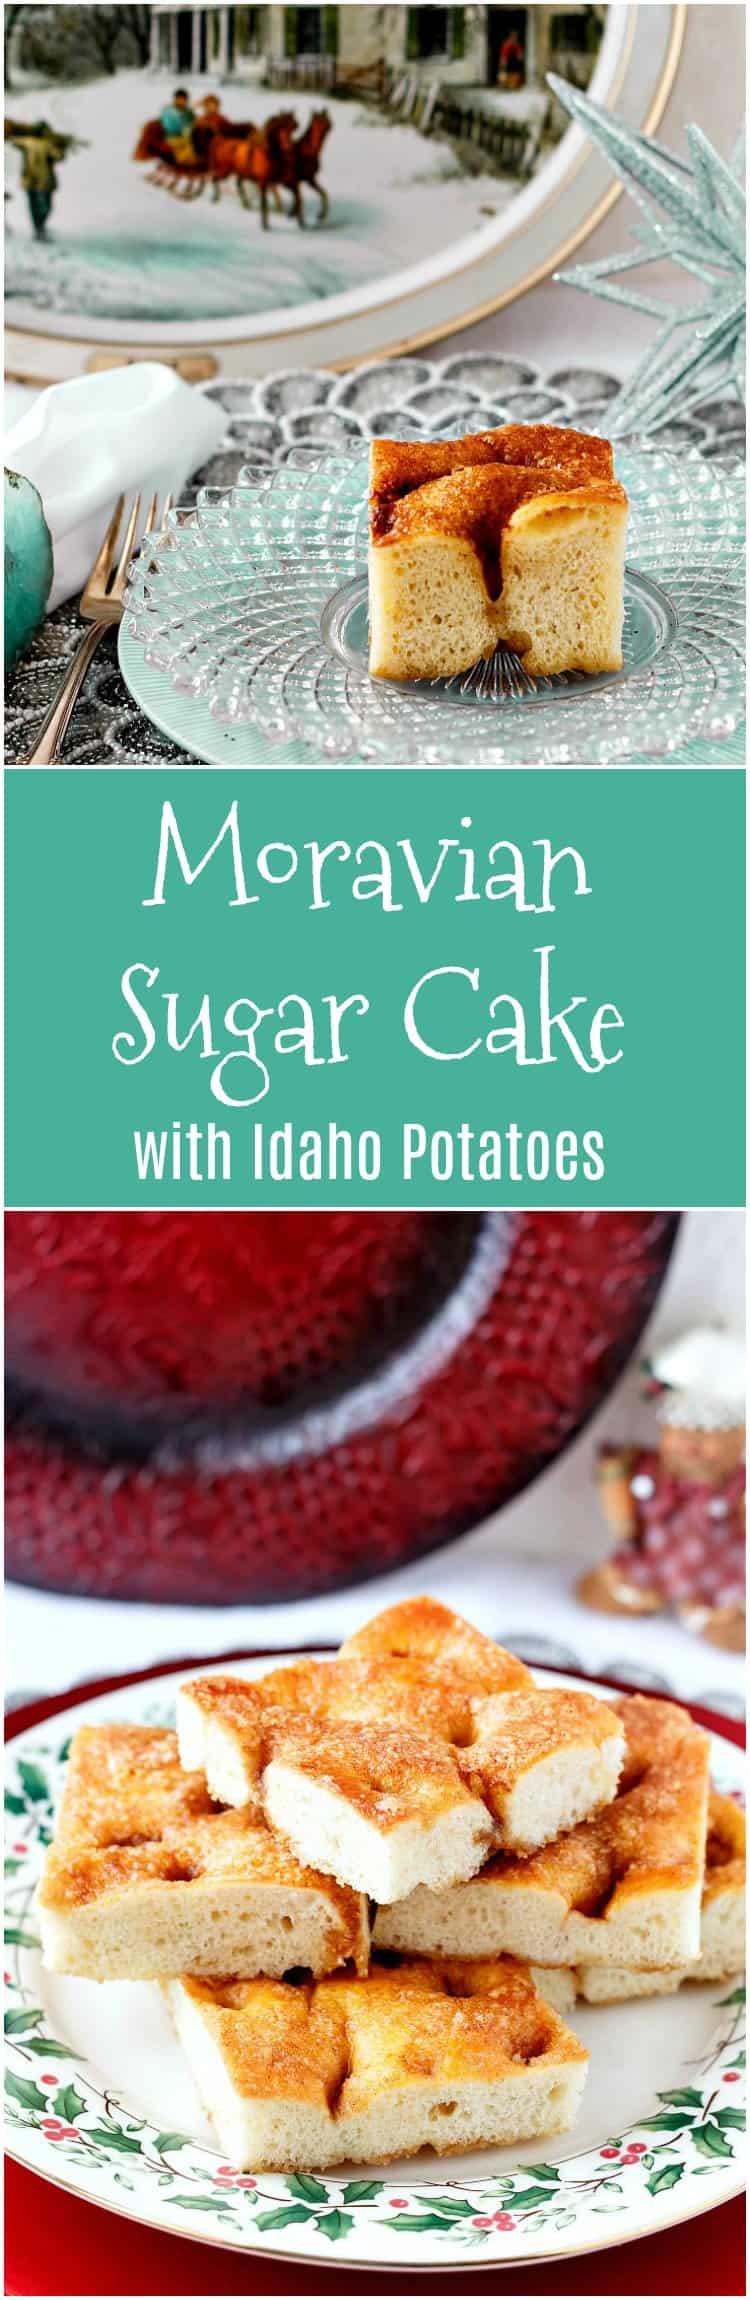 Moravian Sugar Cake with Idaho Potatoes | Best Christmas Coffee Cake